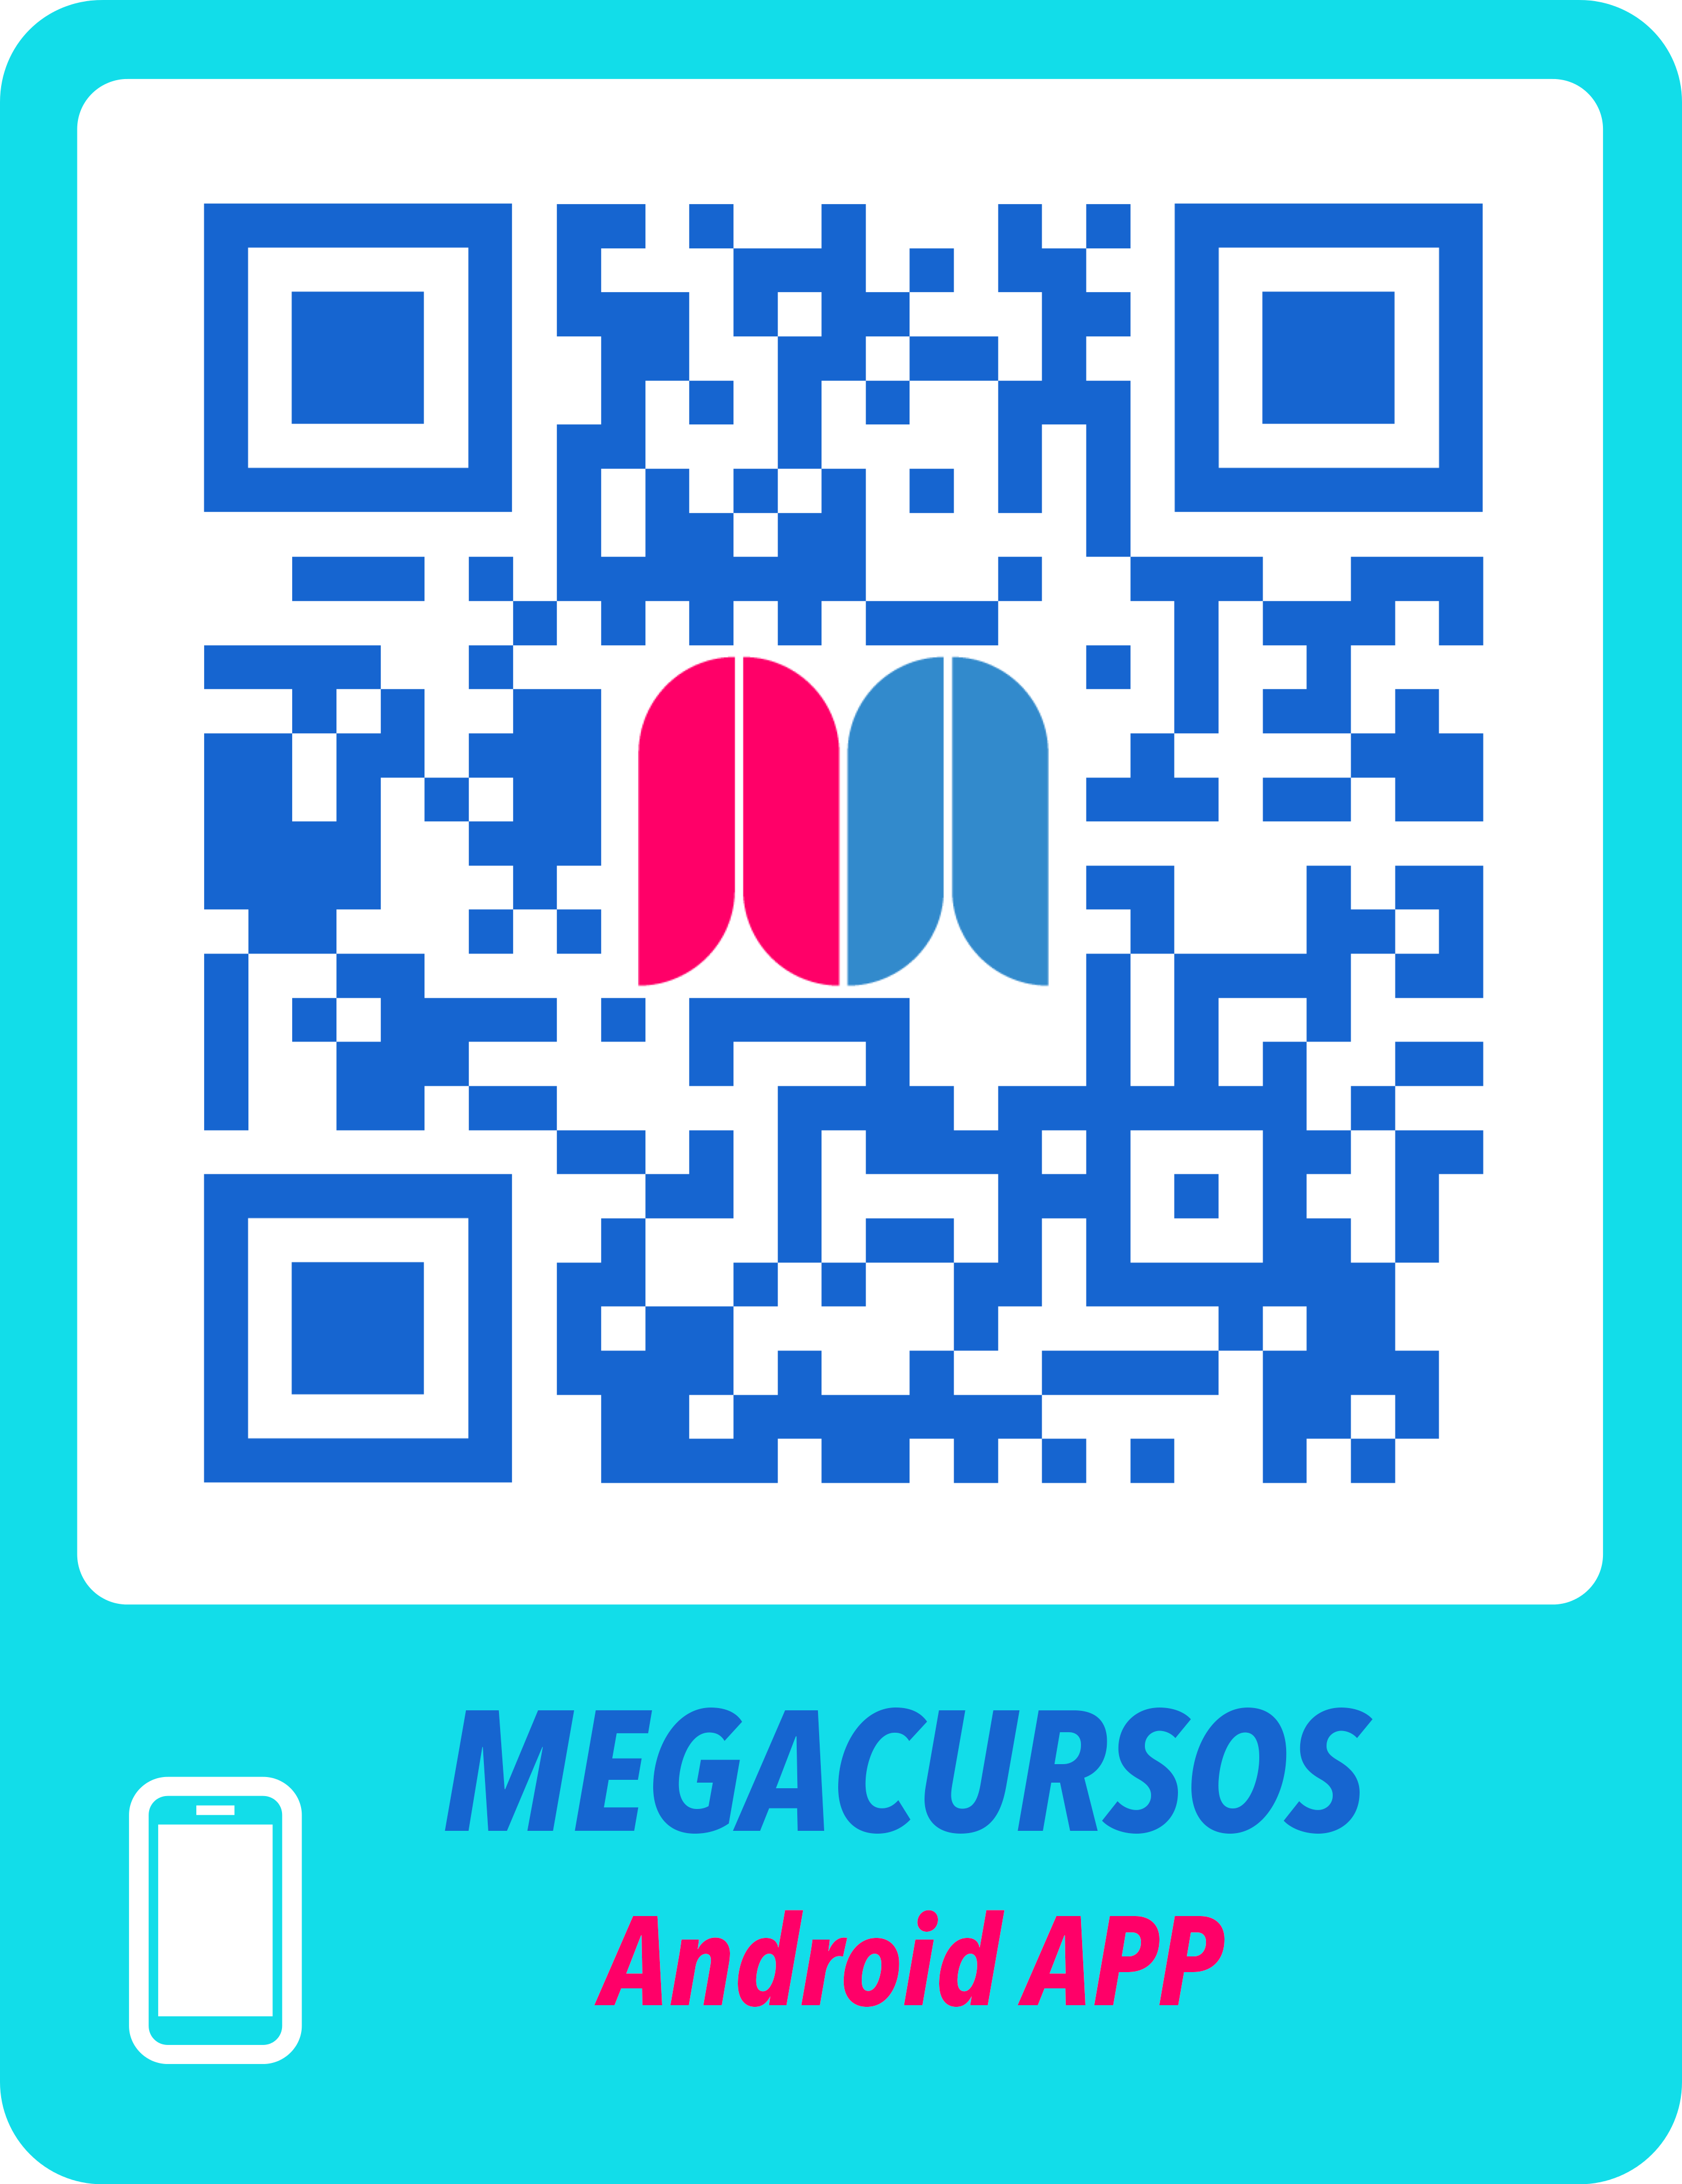 Megacursos_Android_App